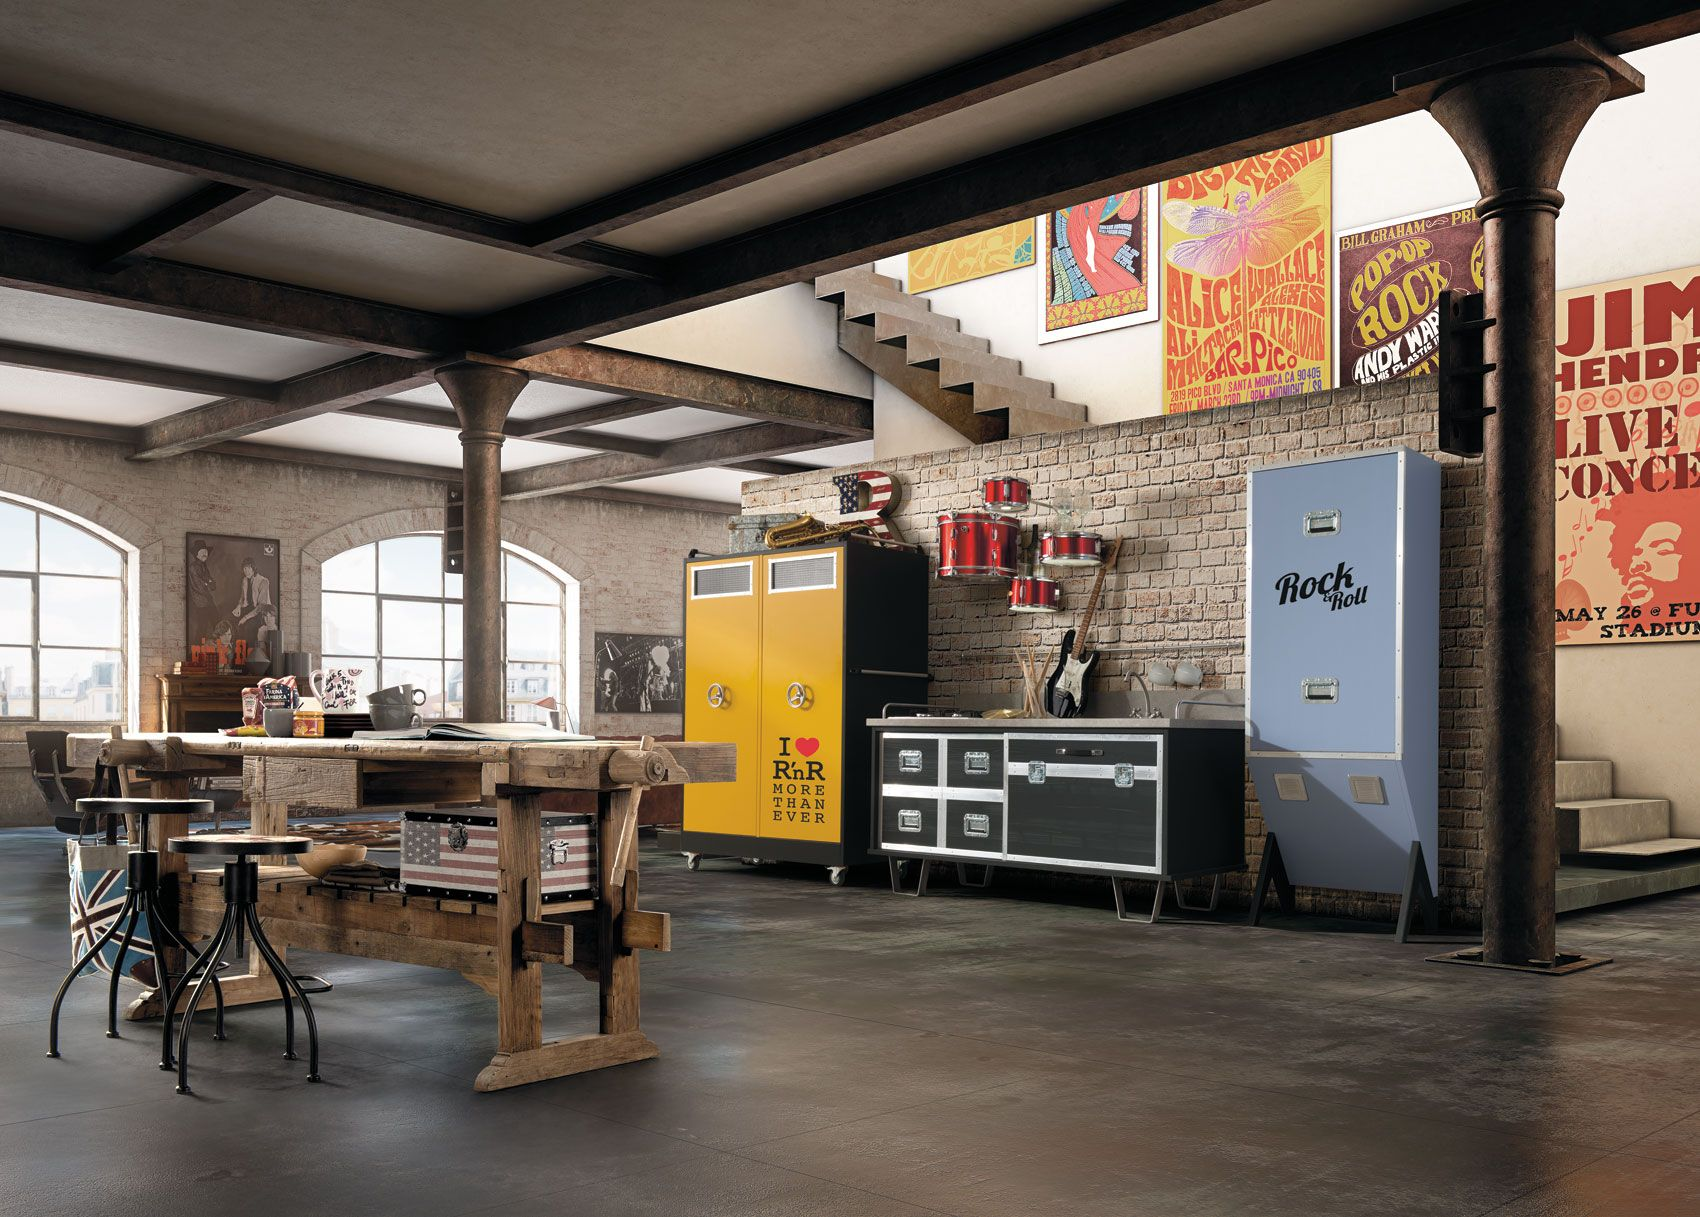 Arredamento Loft ~ Arredamento country vintage industrial loft urban shabby chic